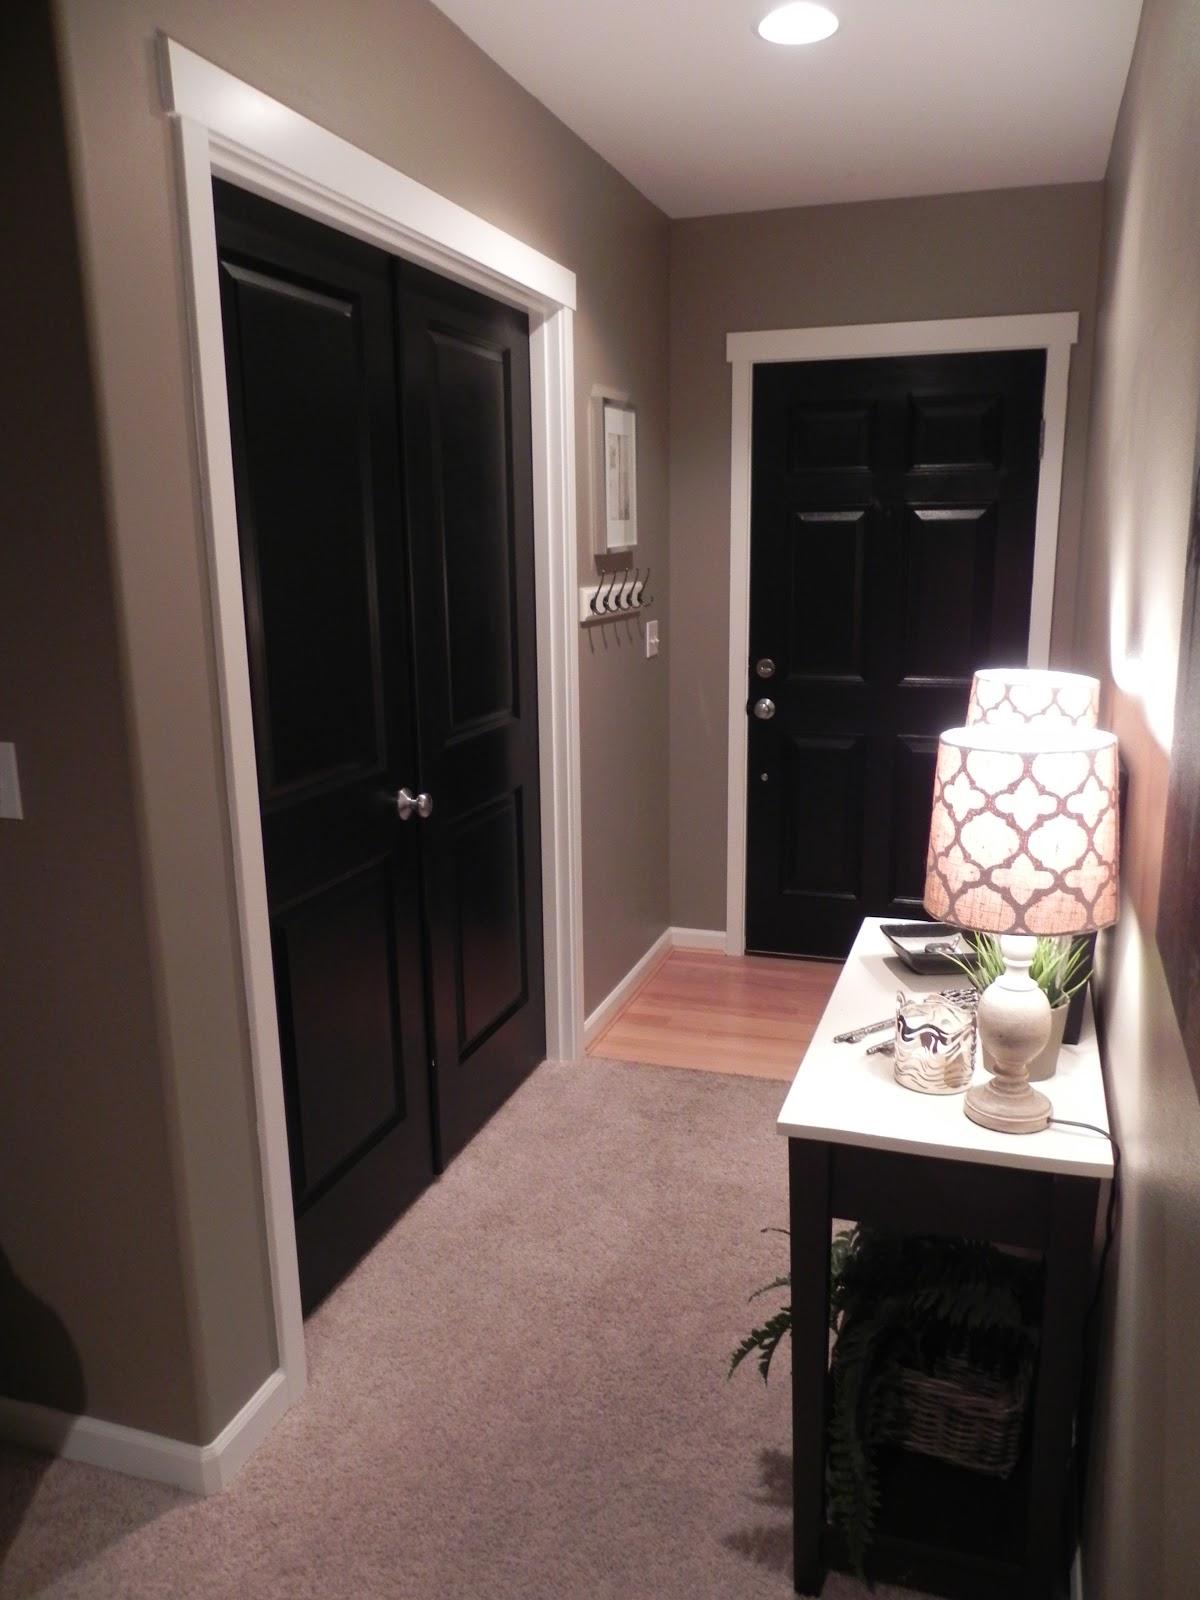 Black Doors Galore & A Decorated Room: Black Doors Galore